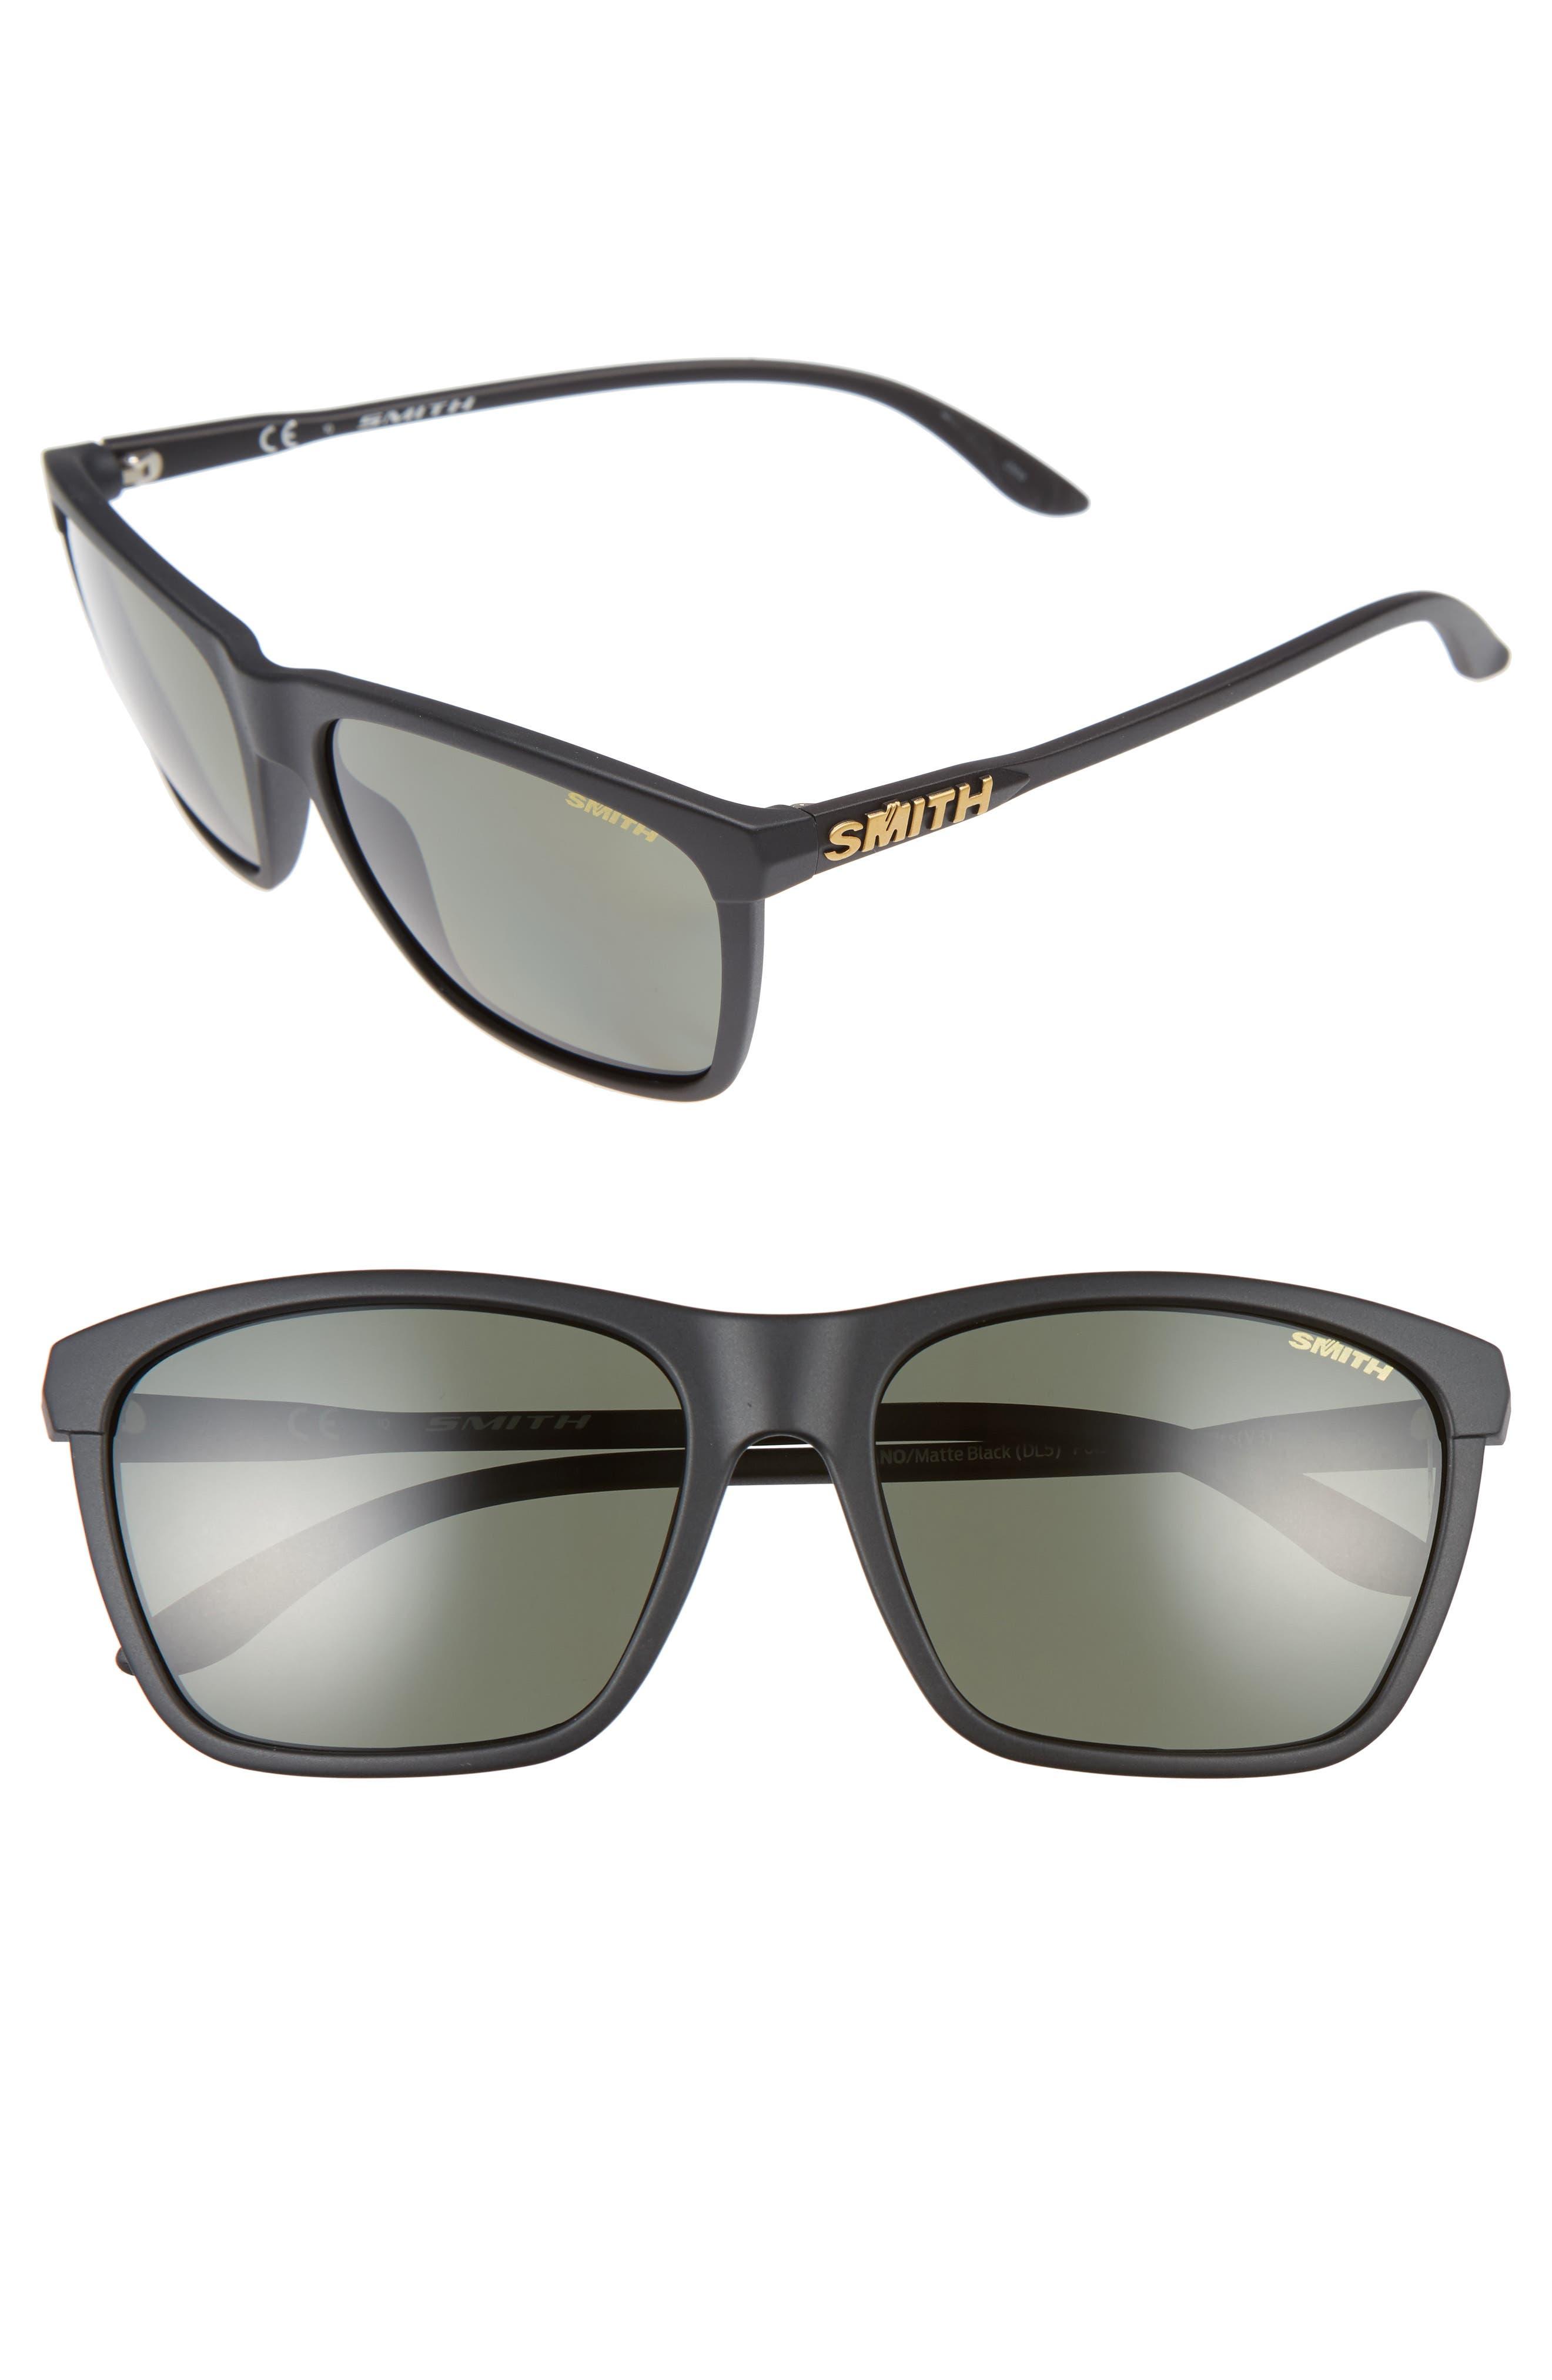 Delano 57mm Sunglasses,                             Main thumbnail 1, color,                             001